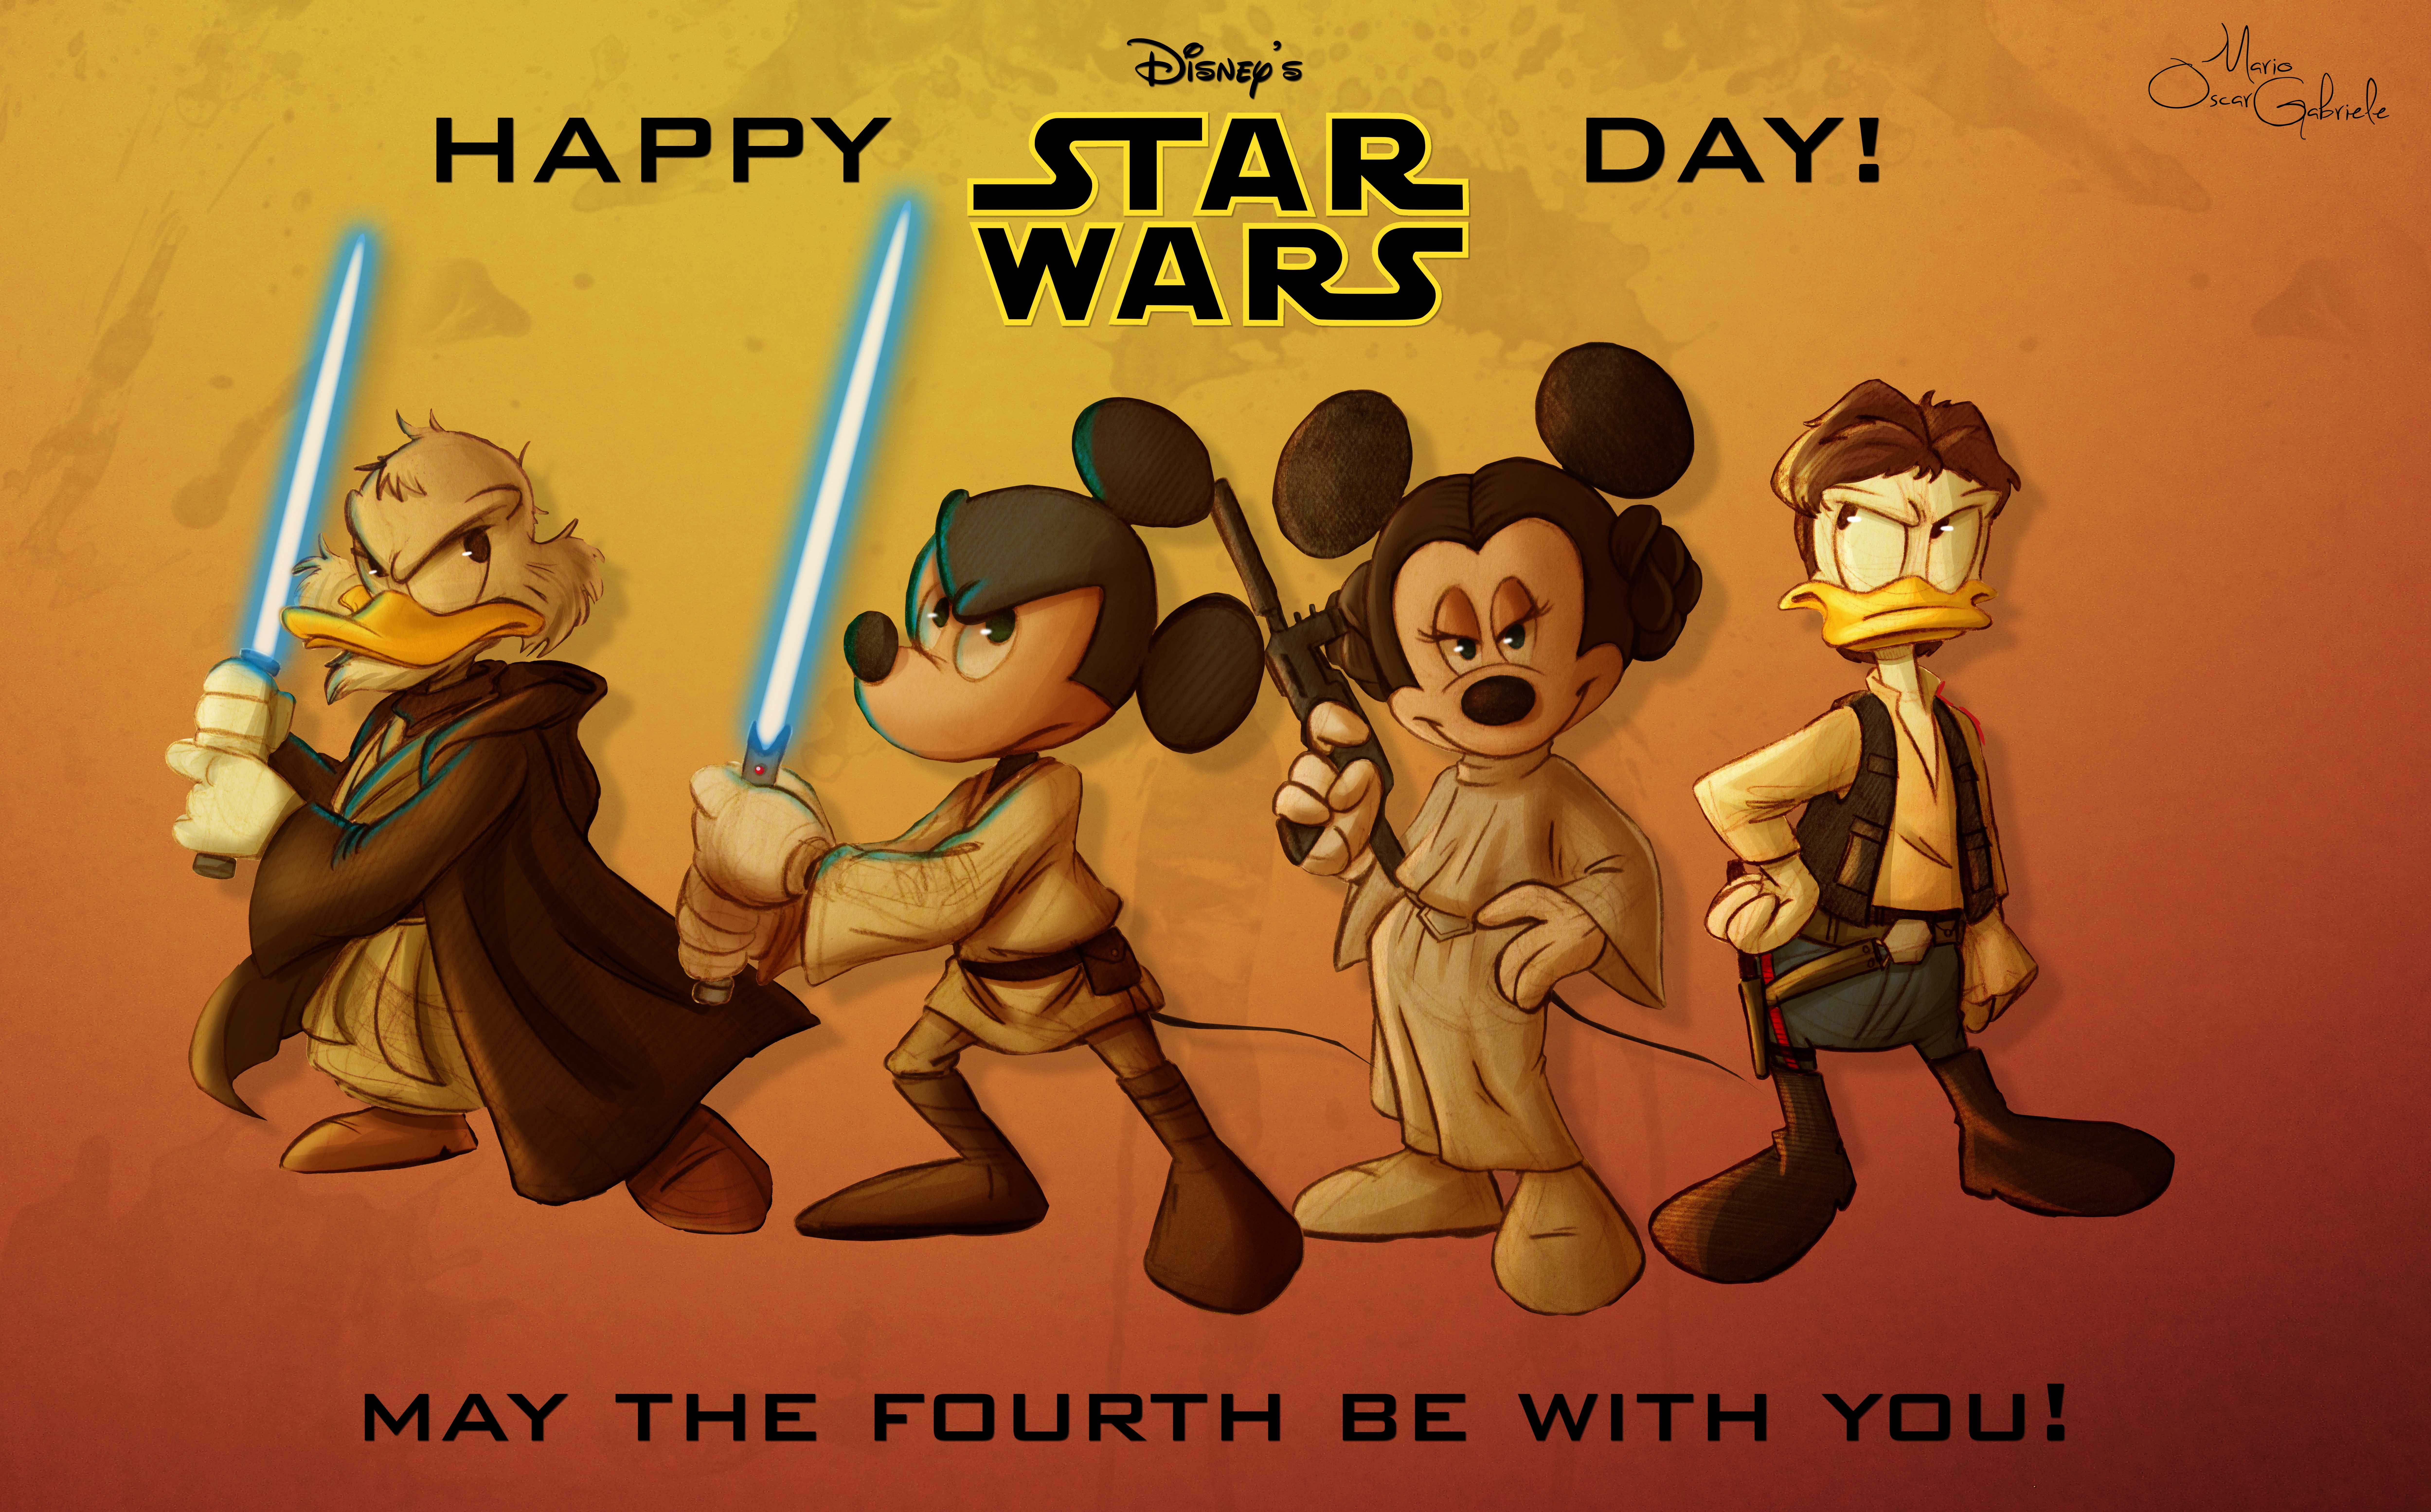 Star Wars Sci Fi Action Fighting Futuristic Series Adventure Disney Poster Wallpaper 9995x6218 934257 Wallpaperup